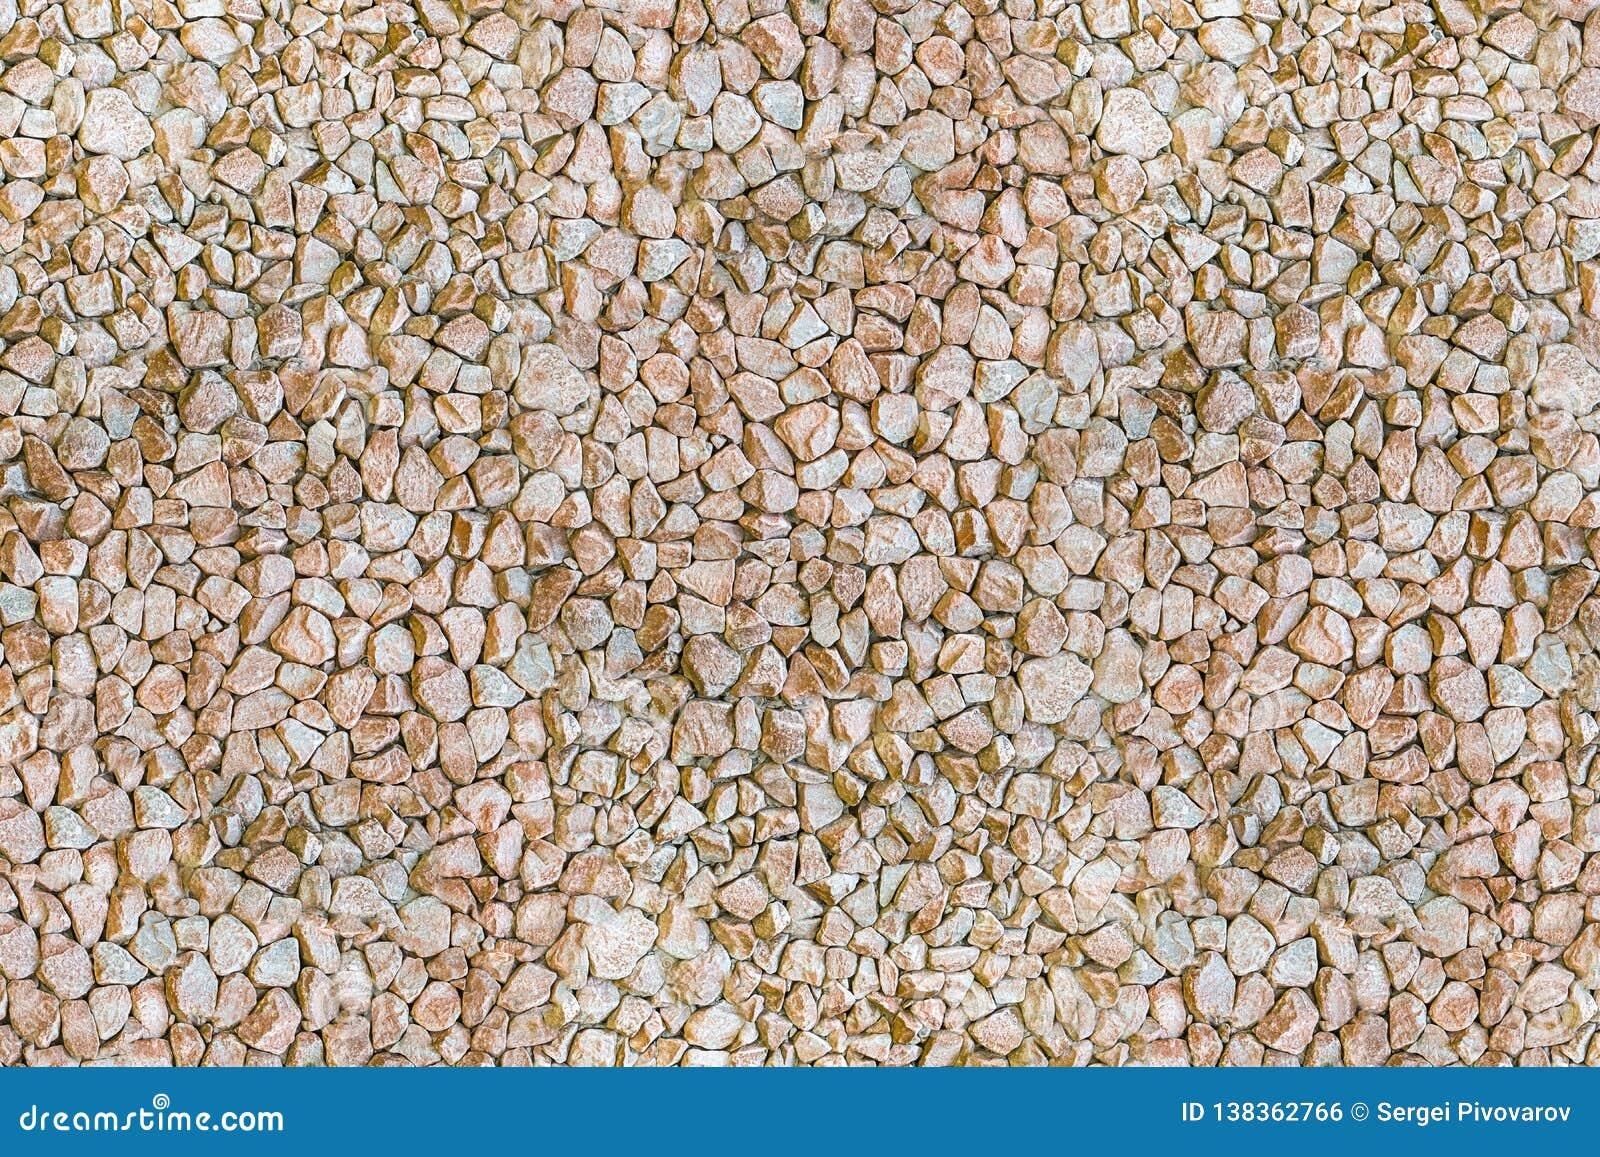 Light beige gray gravel many stones background natural base base design decoration set cobblestone pattern hard